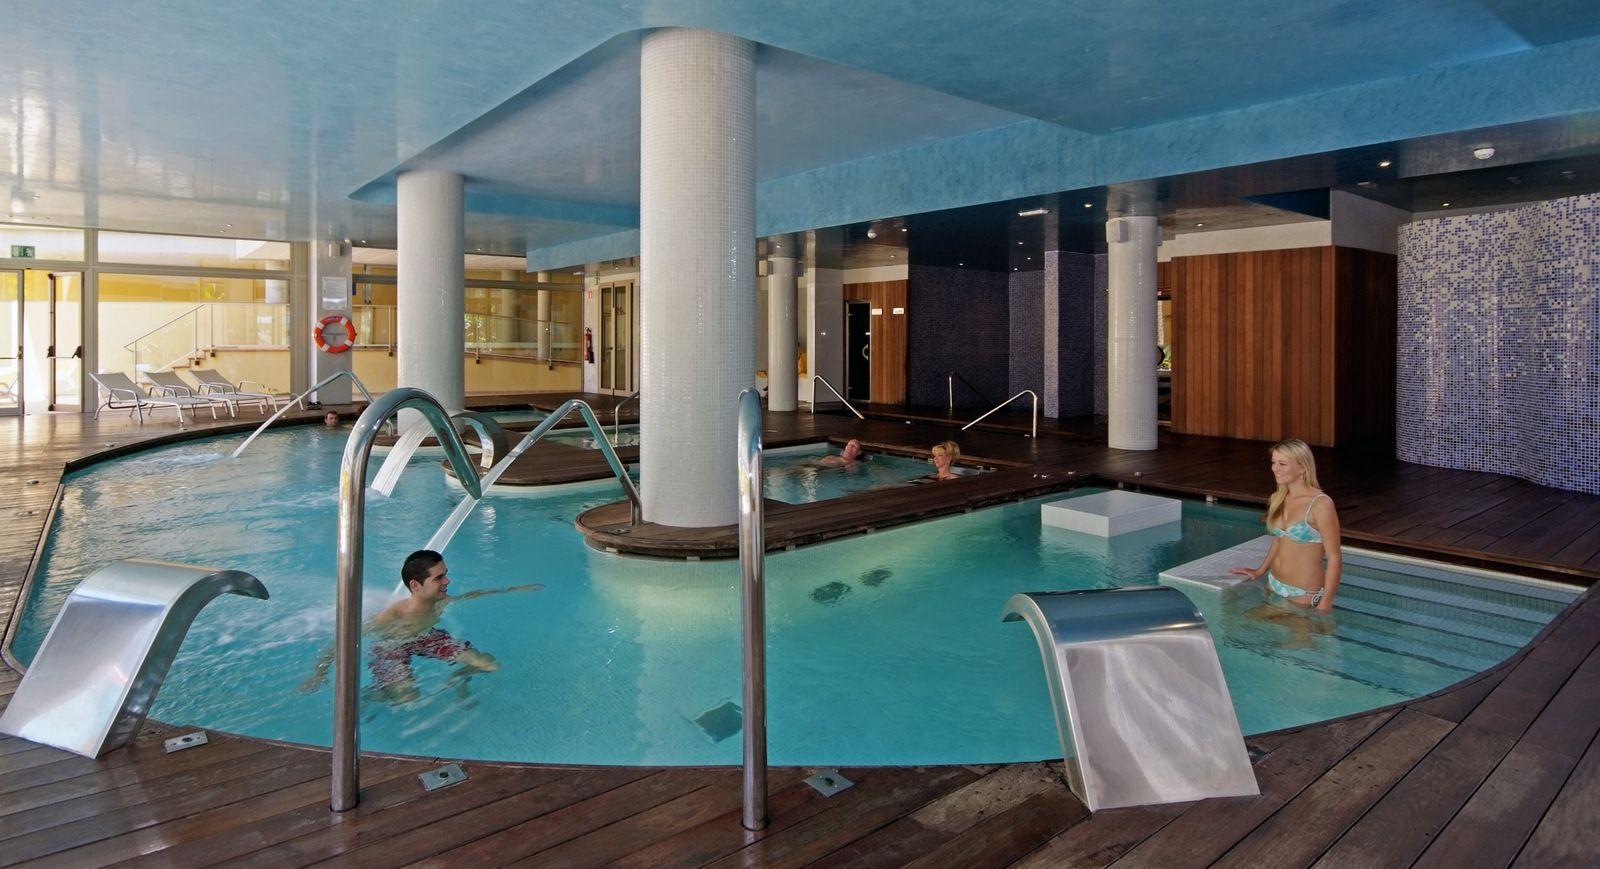 Hotel Iberostar Playa Gaviotas Hoteles De Playa Hoteles Con Spa